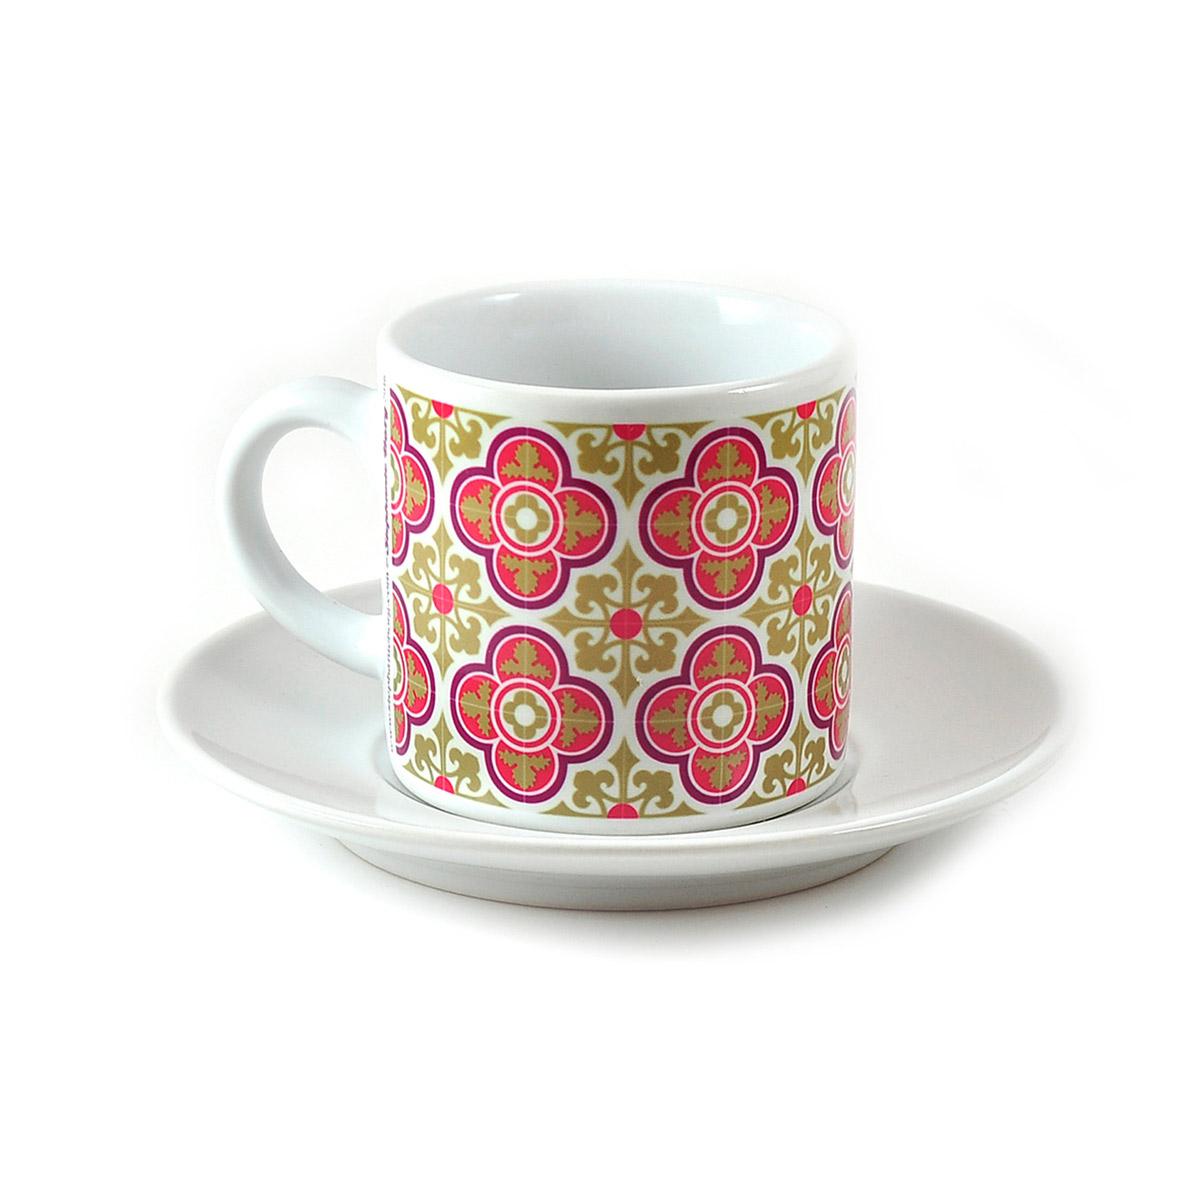 Malta Tile Espresso Cup & Saucer, pattern no.4